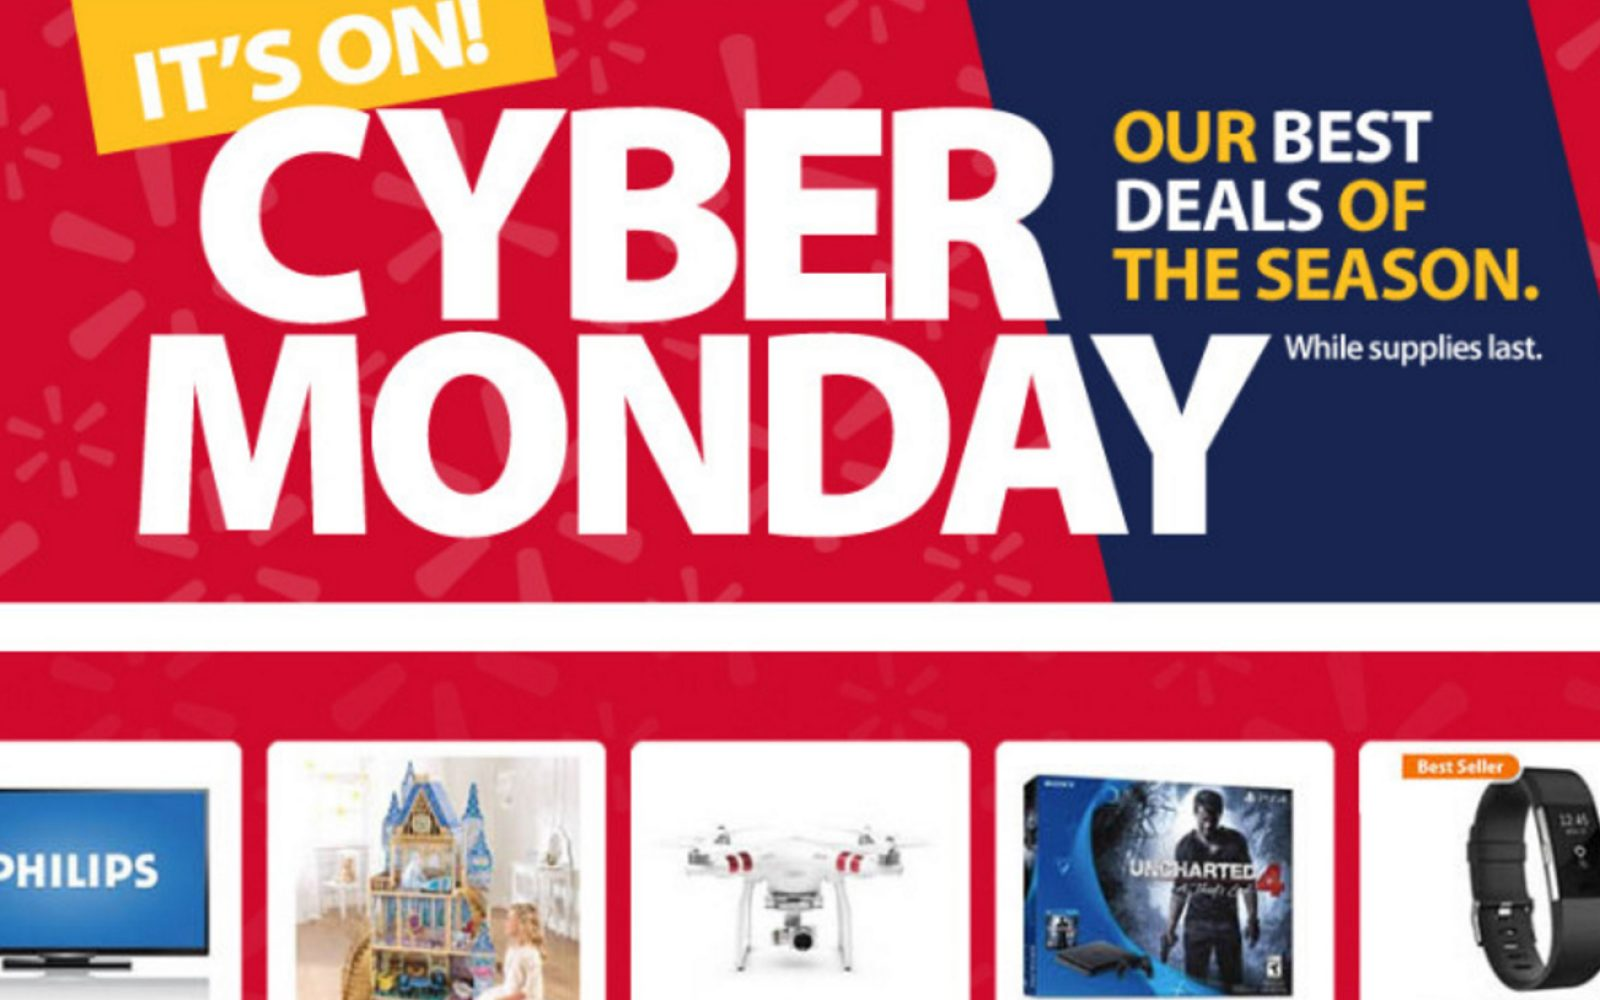 9ad27cc56004 Walmart unveils its plans for Cyber Week 2016: Google Home $99, VIZIO  50-inch 4K UHDTV w/ SmartCast $380, more